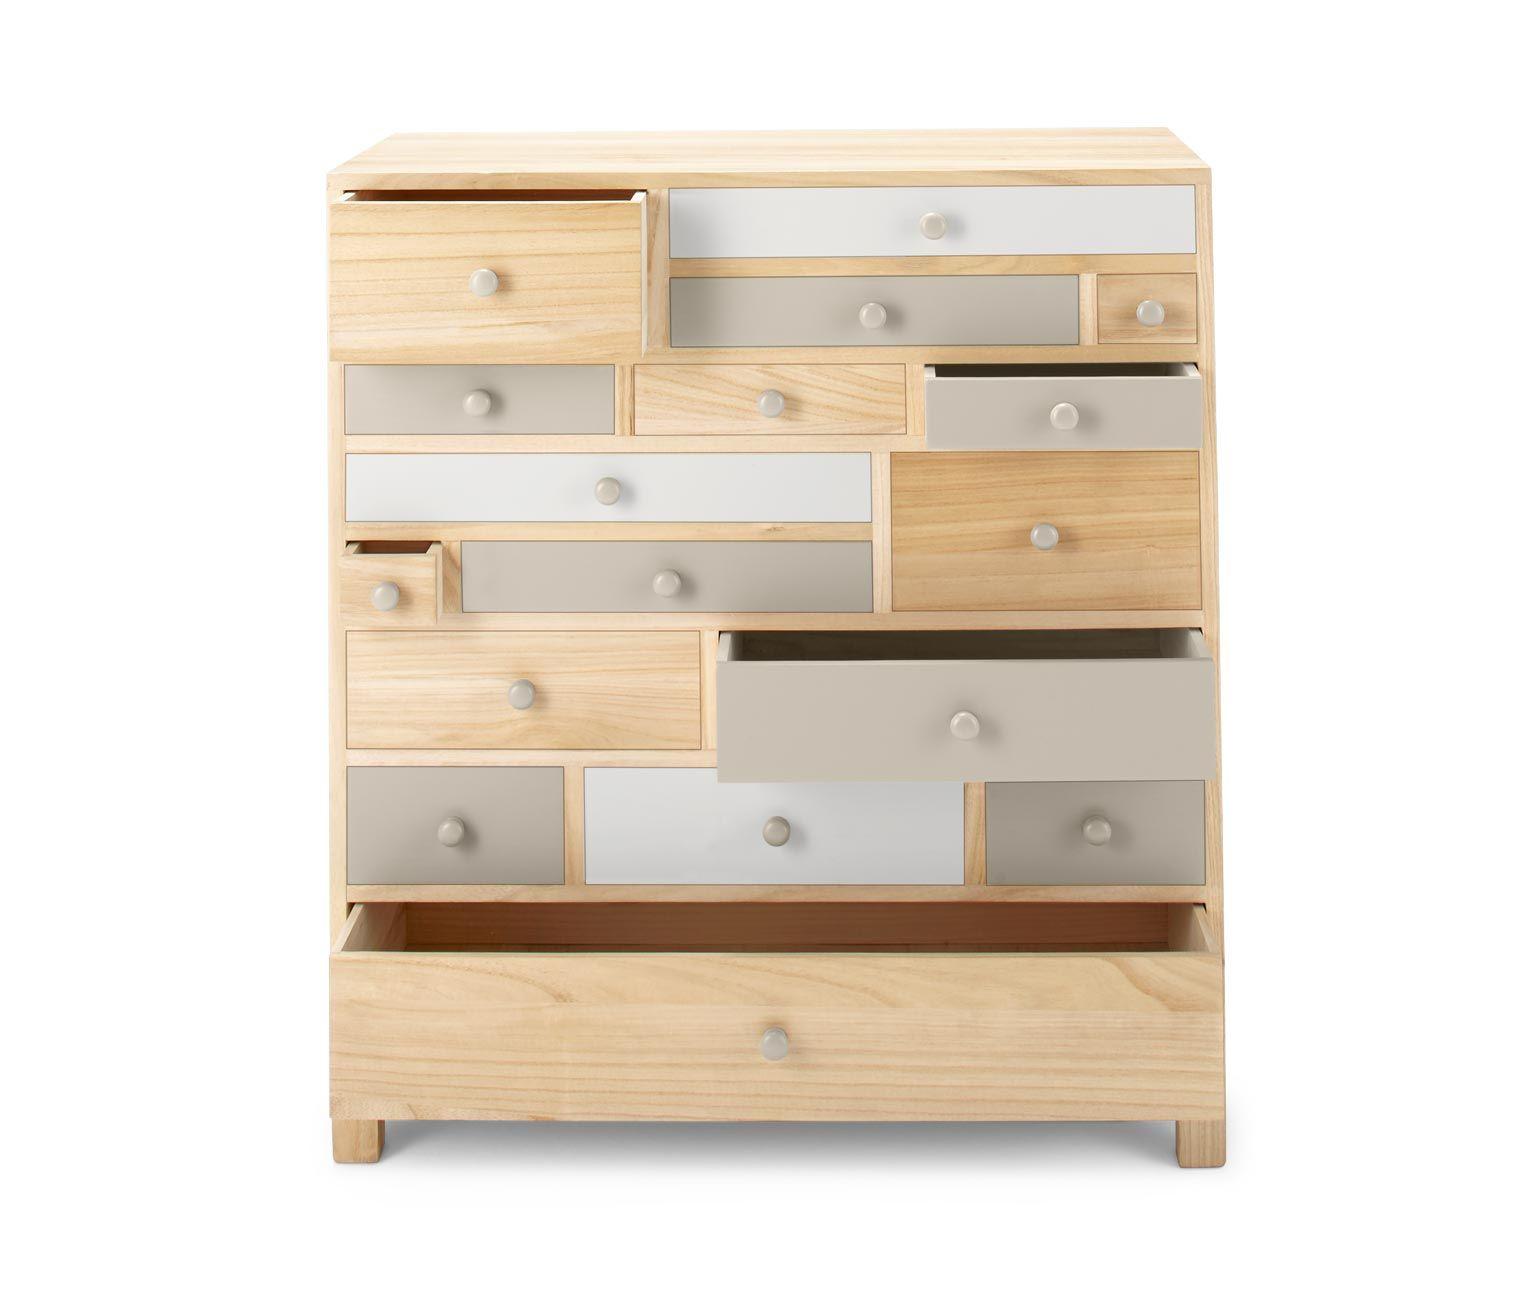 Kommode Home Decor Furniture Decor